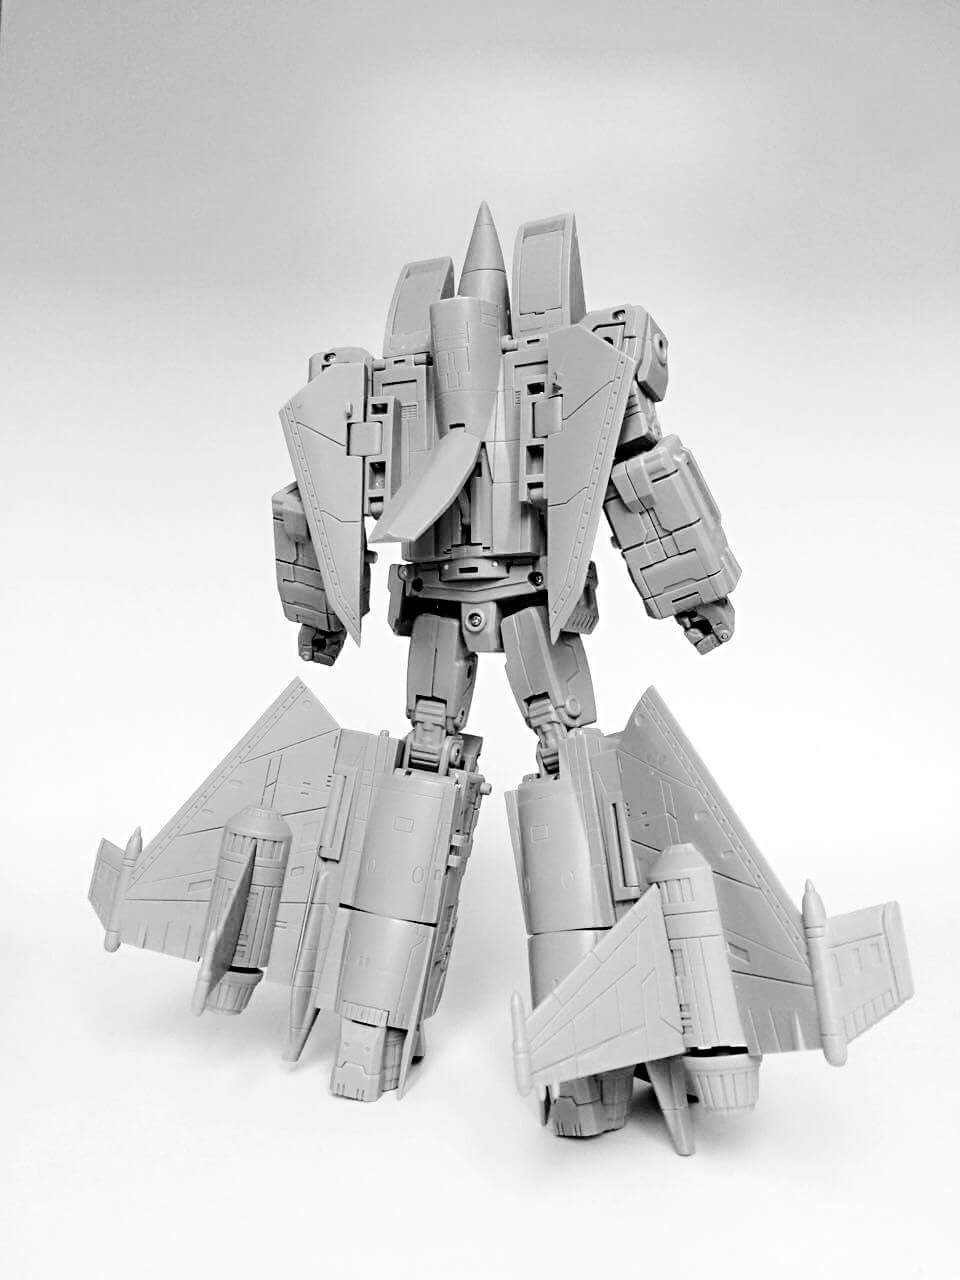 [ToyWorld] Produit Tiers - TW-M02A Combustor (Ramjet/Statoréacto), TW-M02B Assault (Thrust/Fatalo), TW-M02C Requiem (Dirge/Funébro) 9gdjP06h